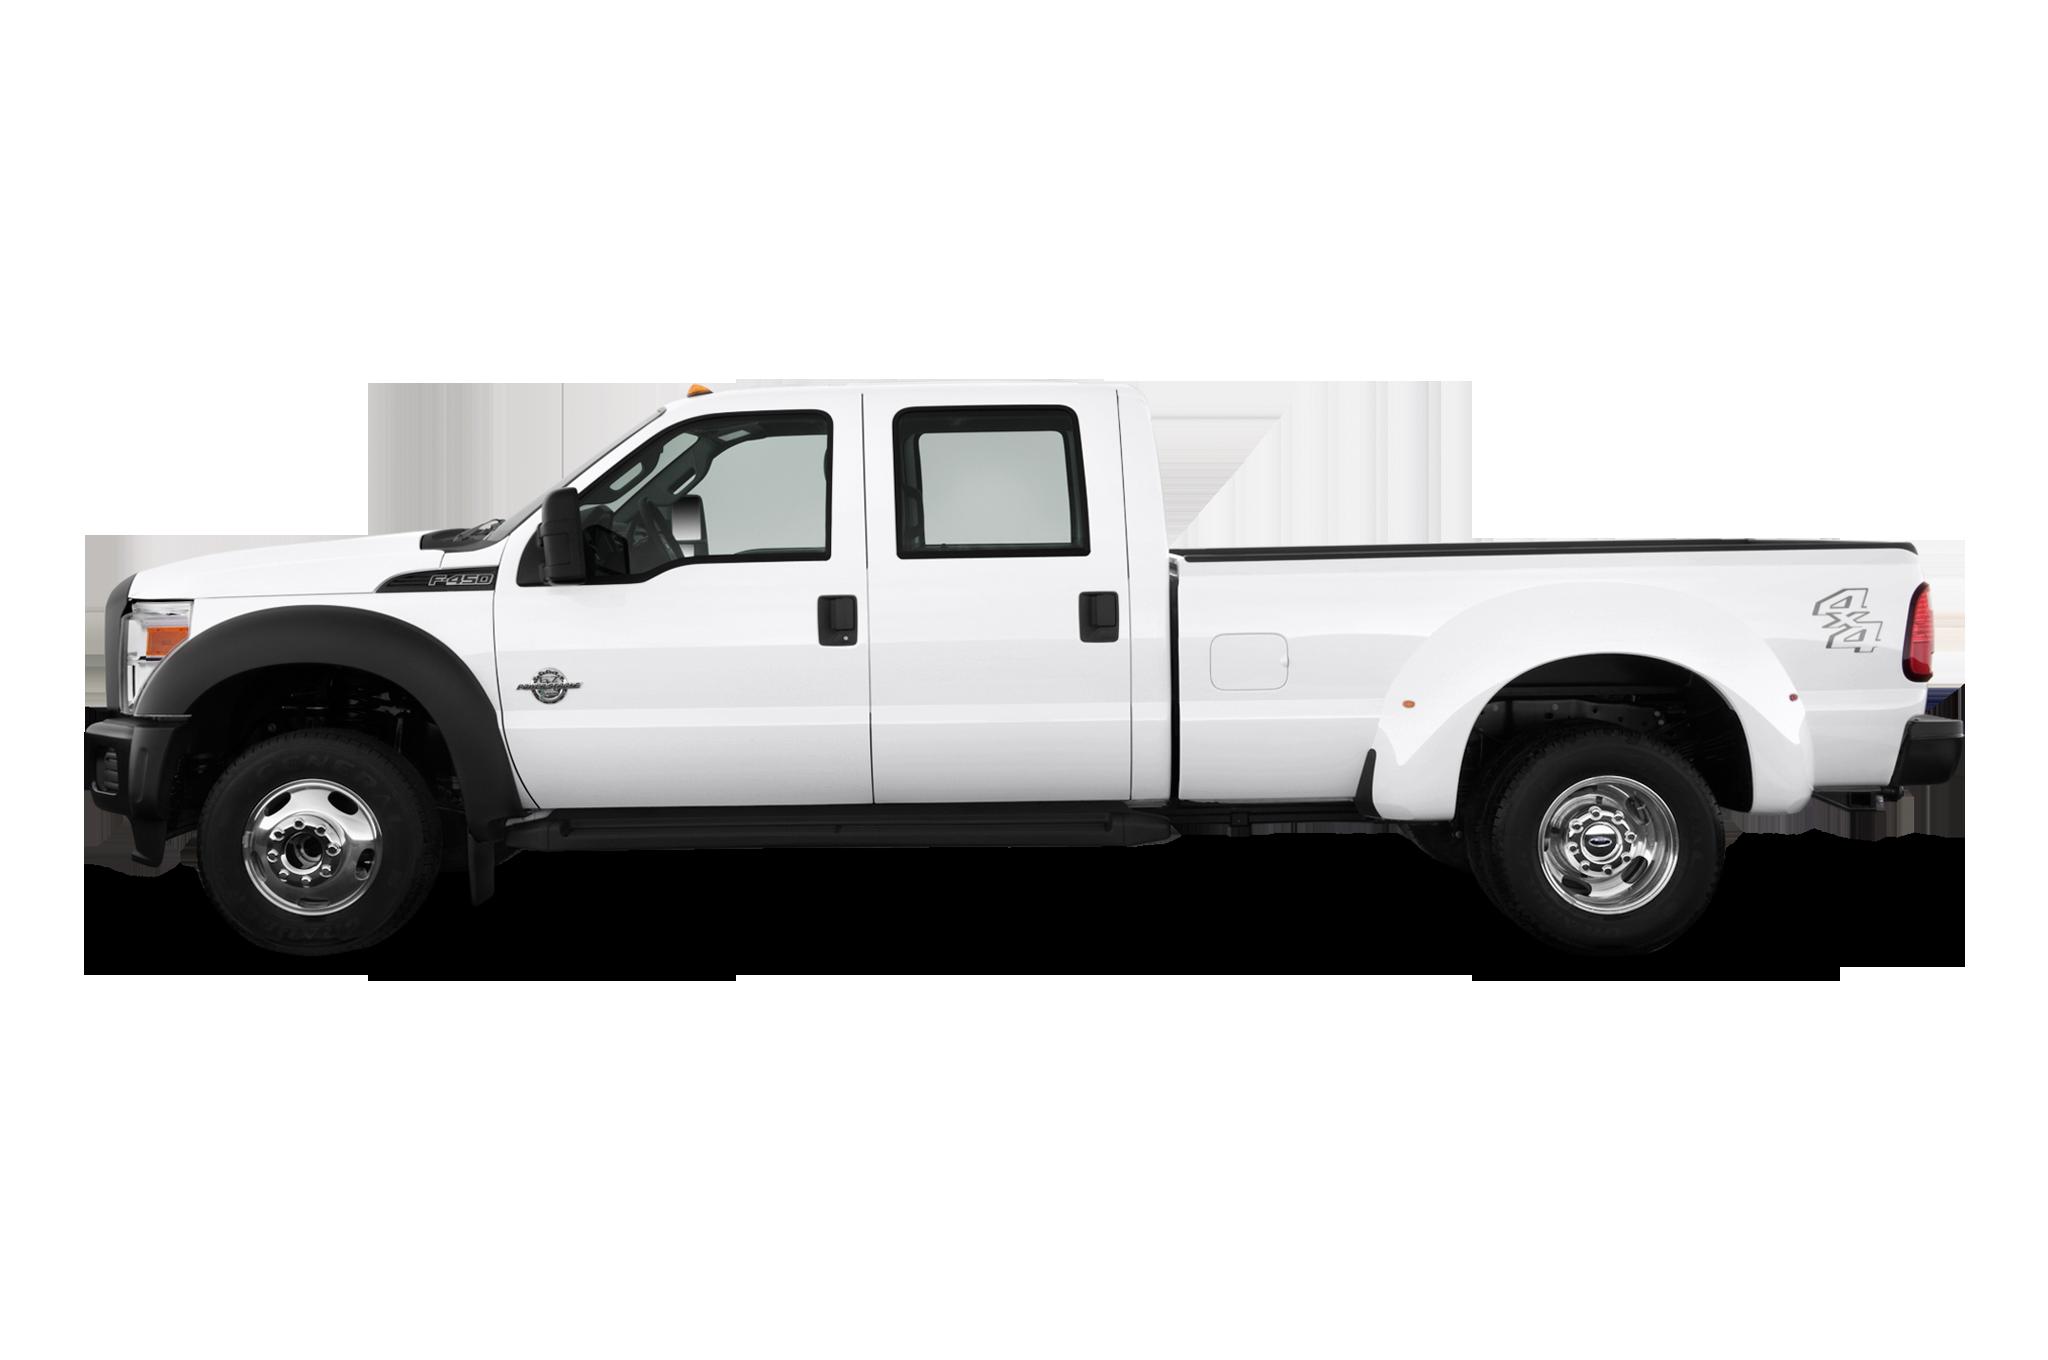 Ford Adding 6.8-liter Gas V-10 Option To 2012 F-650